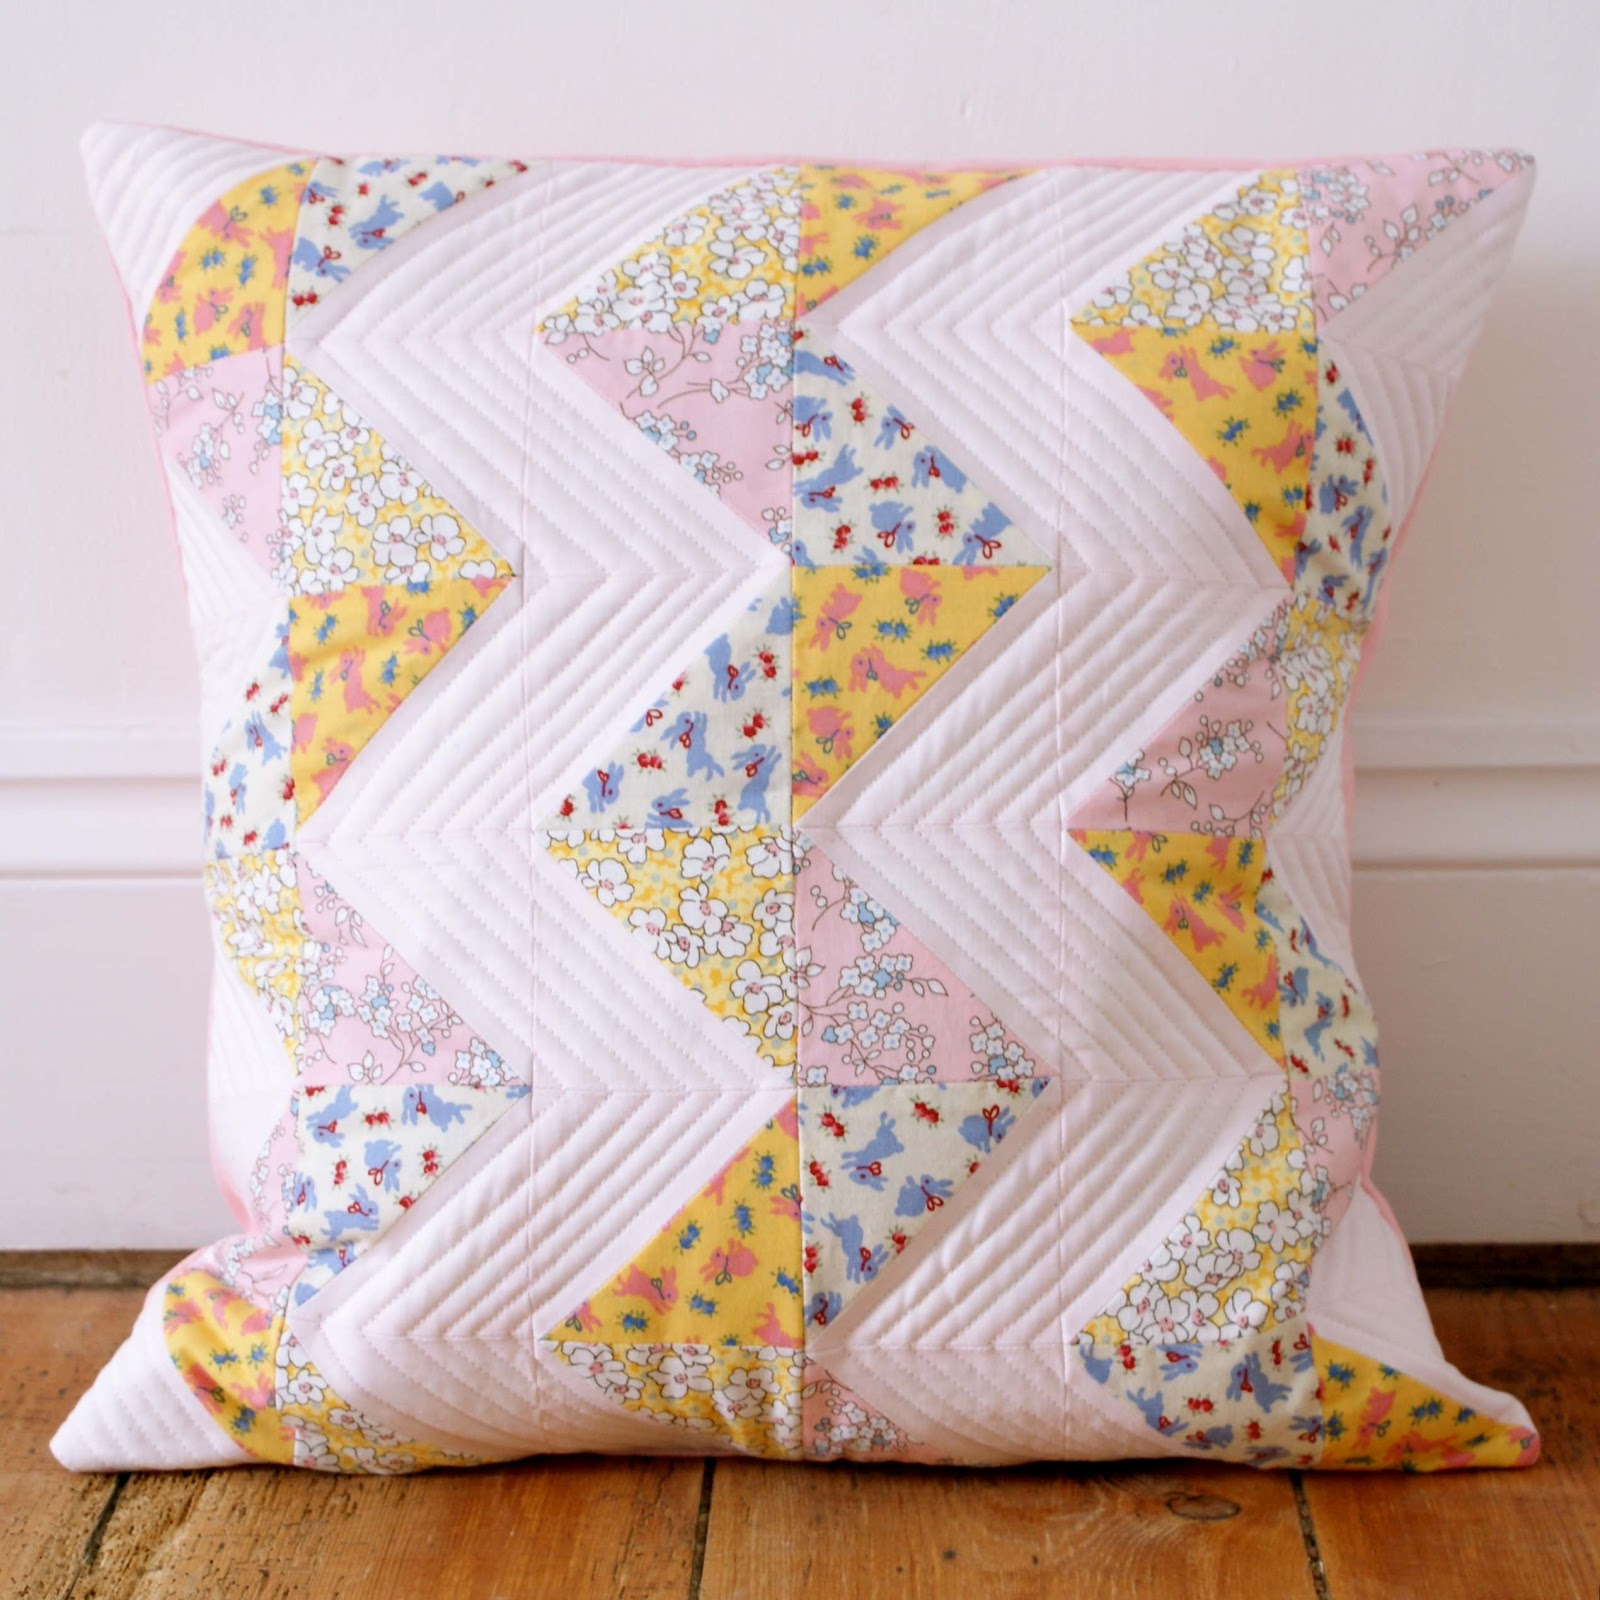 messyjesse a quilt blog by jessie fincham chevron patchwork pillow tutorial. Black Bedroom Furniture Sets. Home Design Ideas